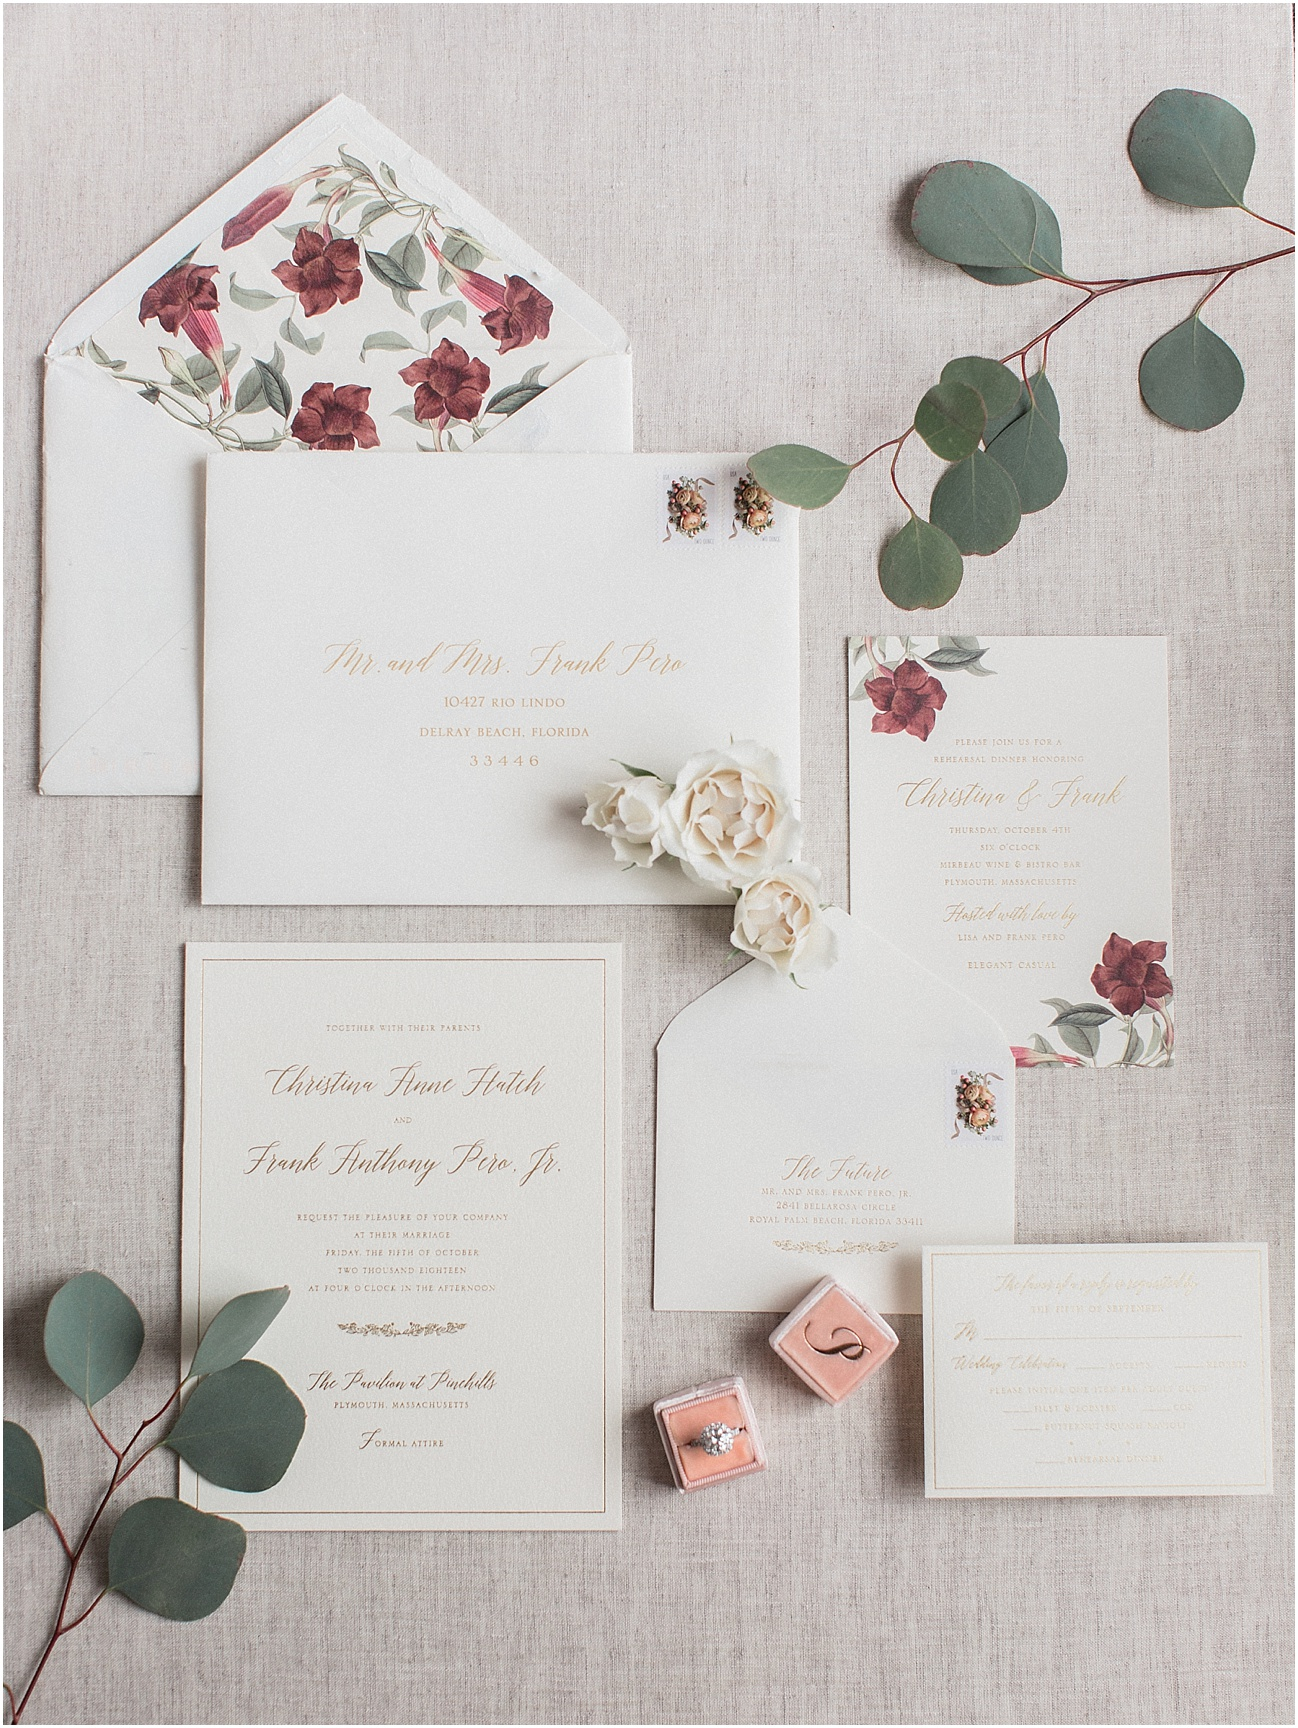 christina_frank_the_pavilion_at_pine_hills_fall_wine_cape_cod_boston_wedding_photographer_meredith_jane_photography_photo_1216.jpg